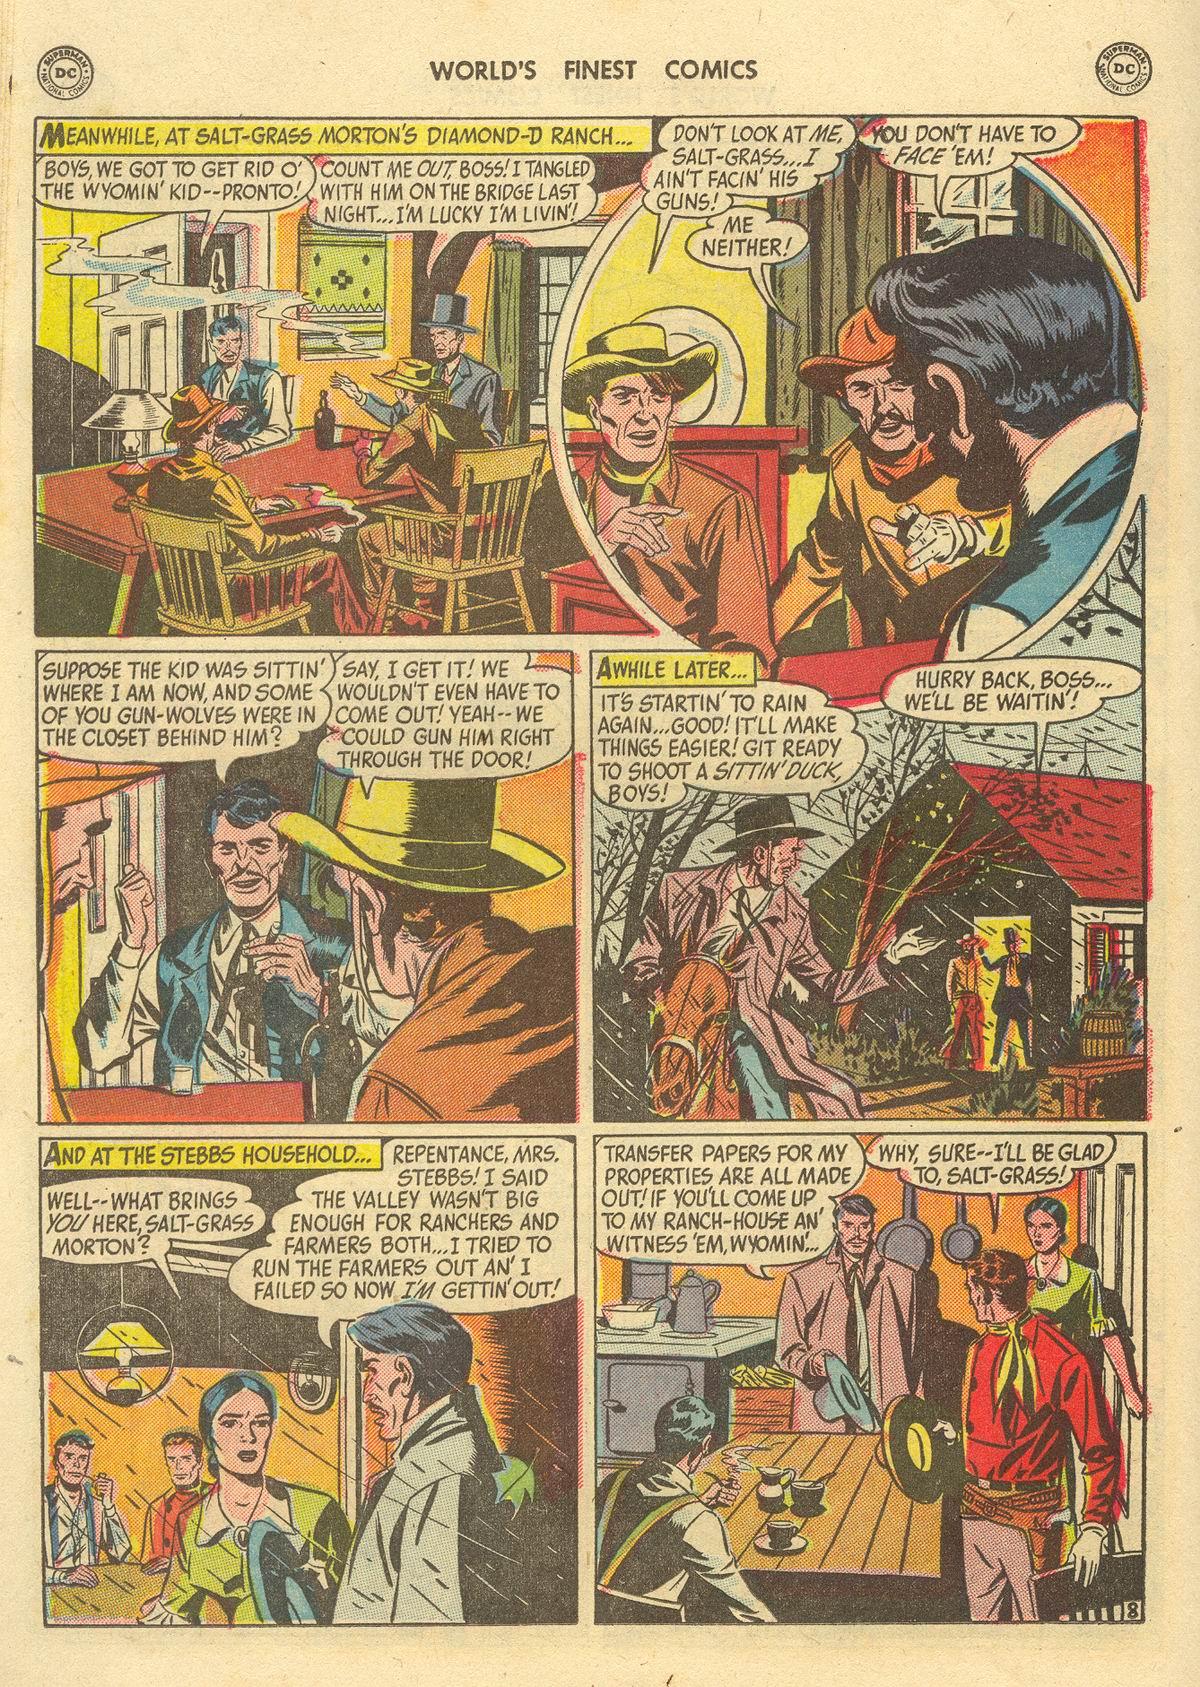 Read online World's Finest Comics comic -  Issue #51 - 50